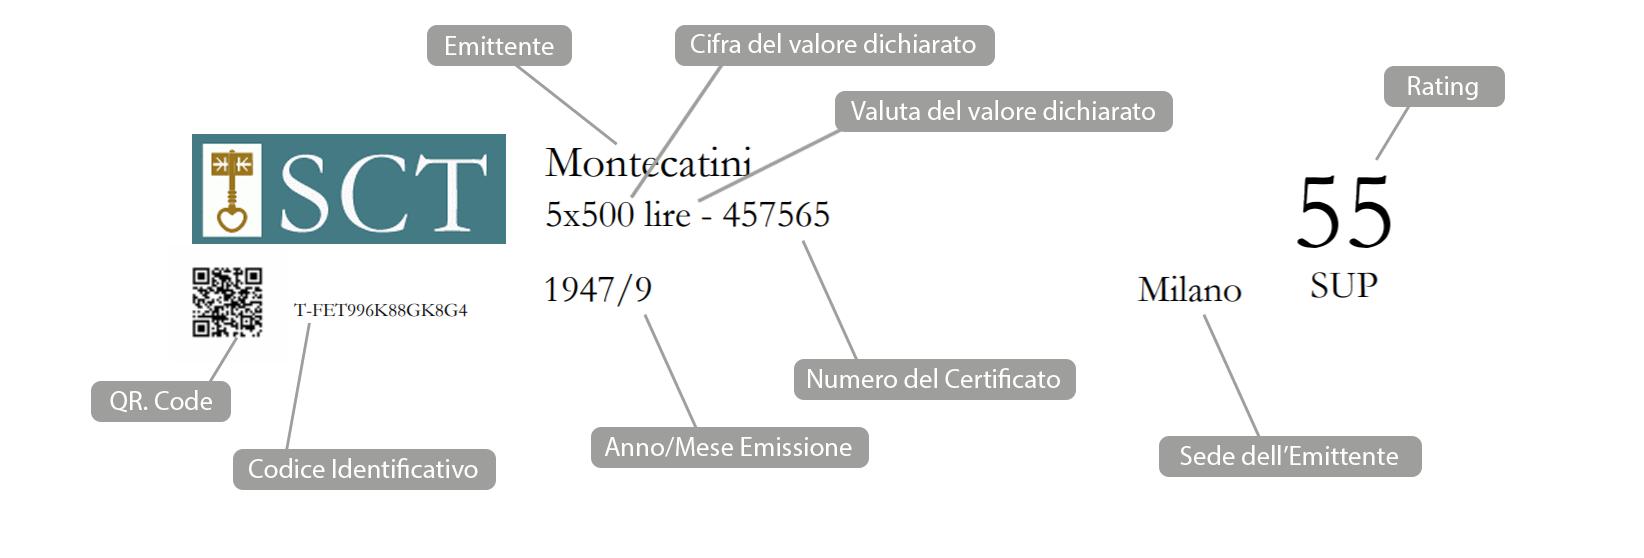 etichetta SCT - Montecatini